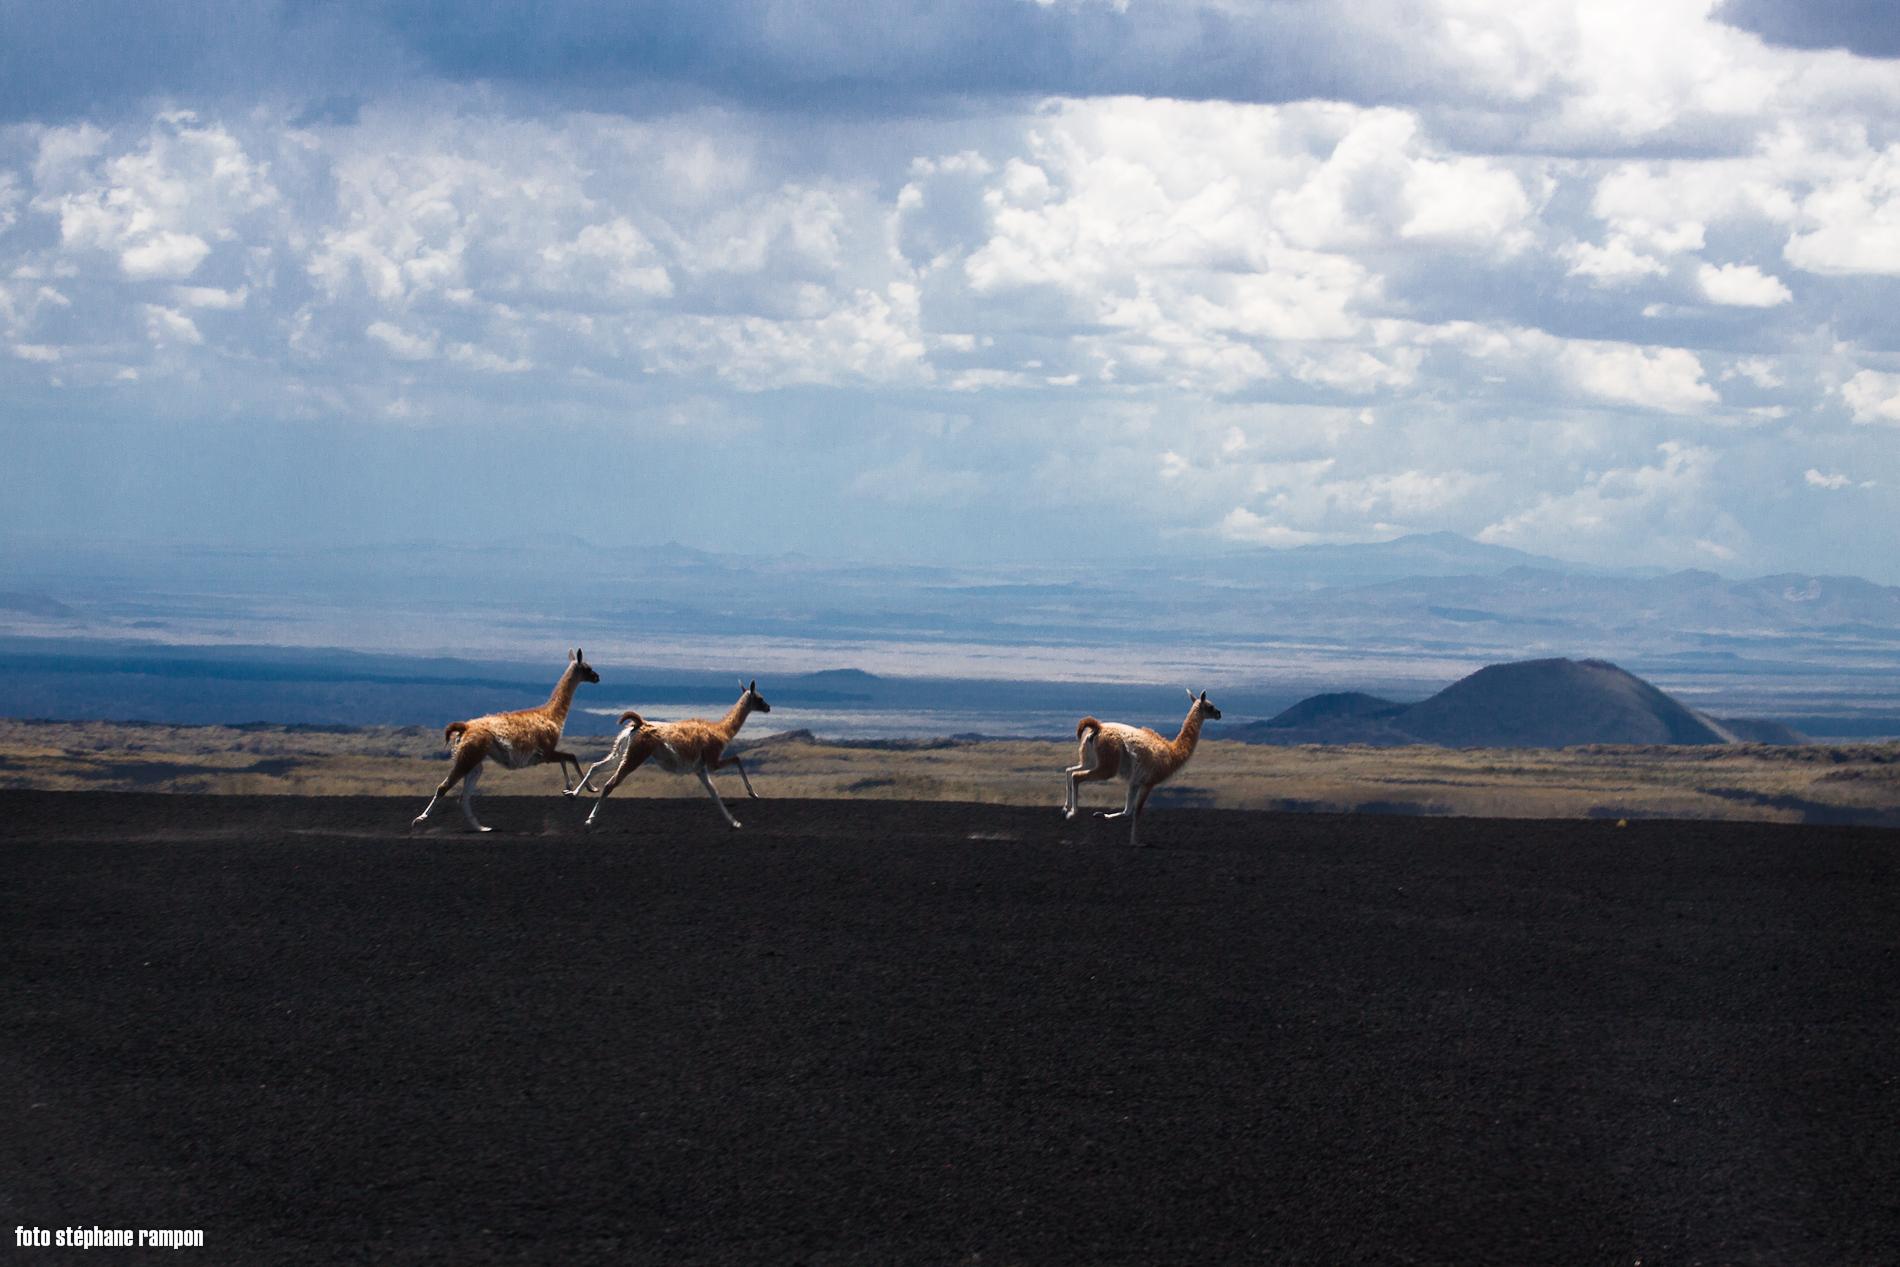 wine-TROTTERS_oenotourisme_wine-tourism-agency_tour_vino_vin_turismo_ARGENTINA_Mendoza_trekking_hiking_horseback-riding_alta-montana_Andes_55.jpg